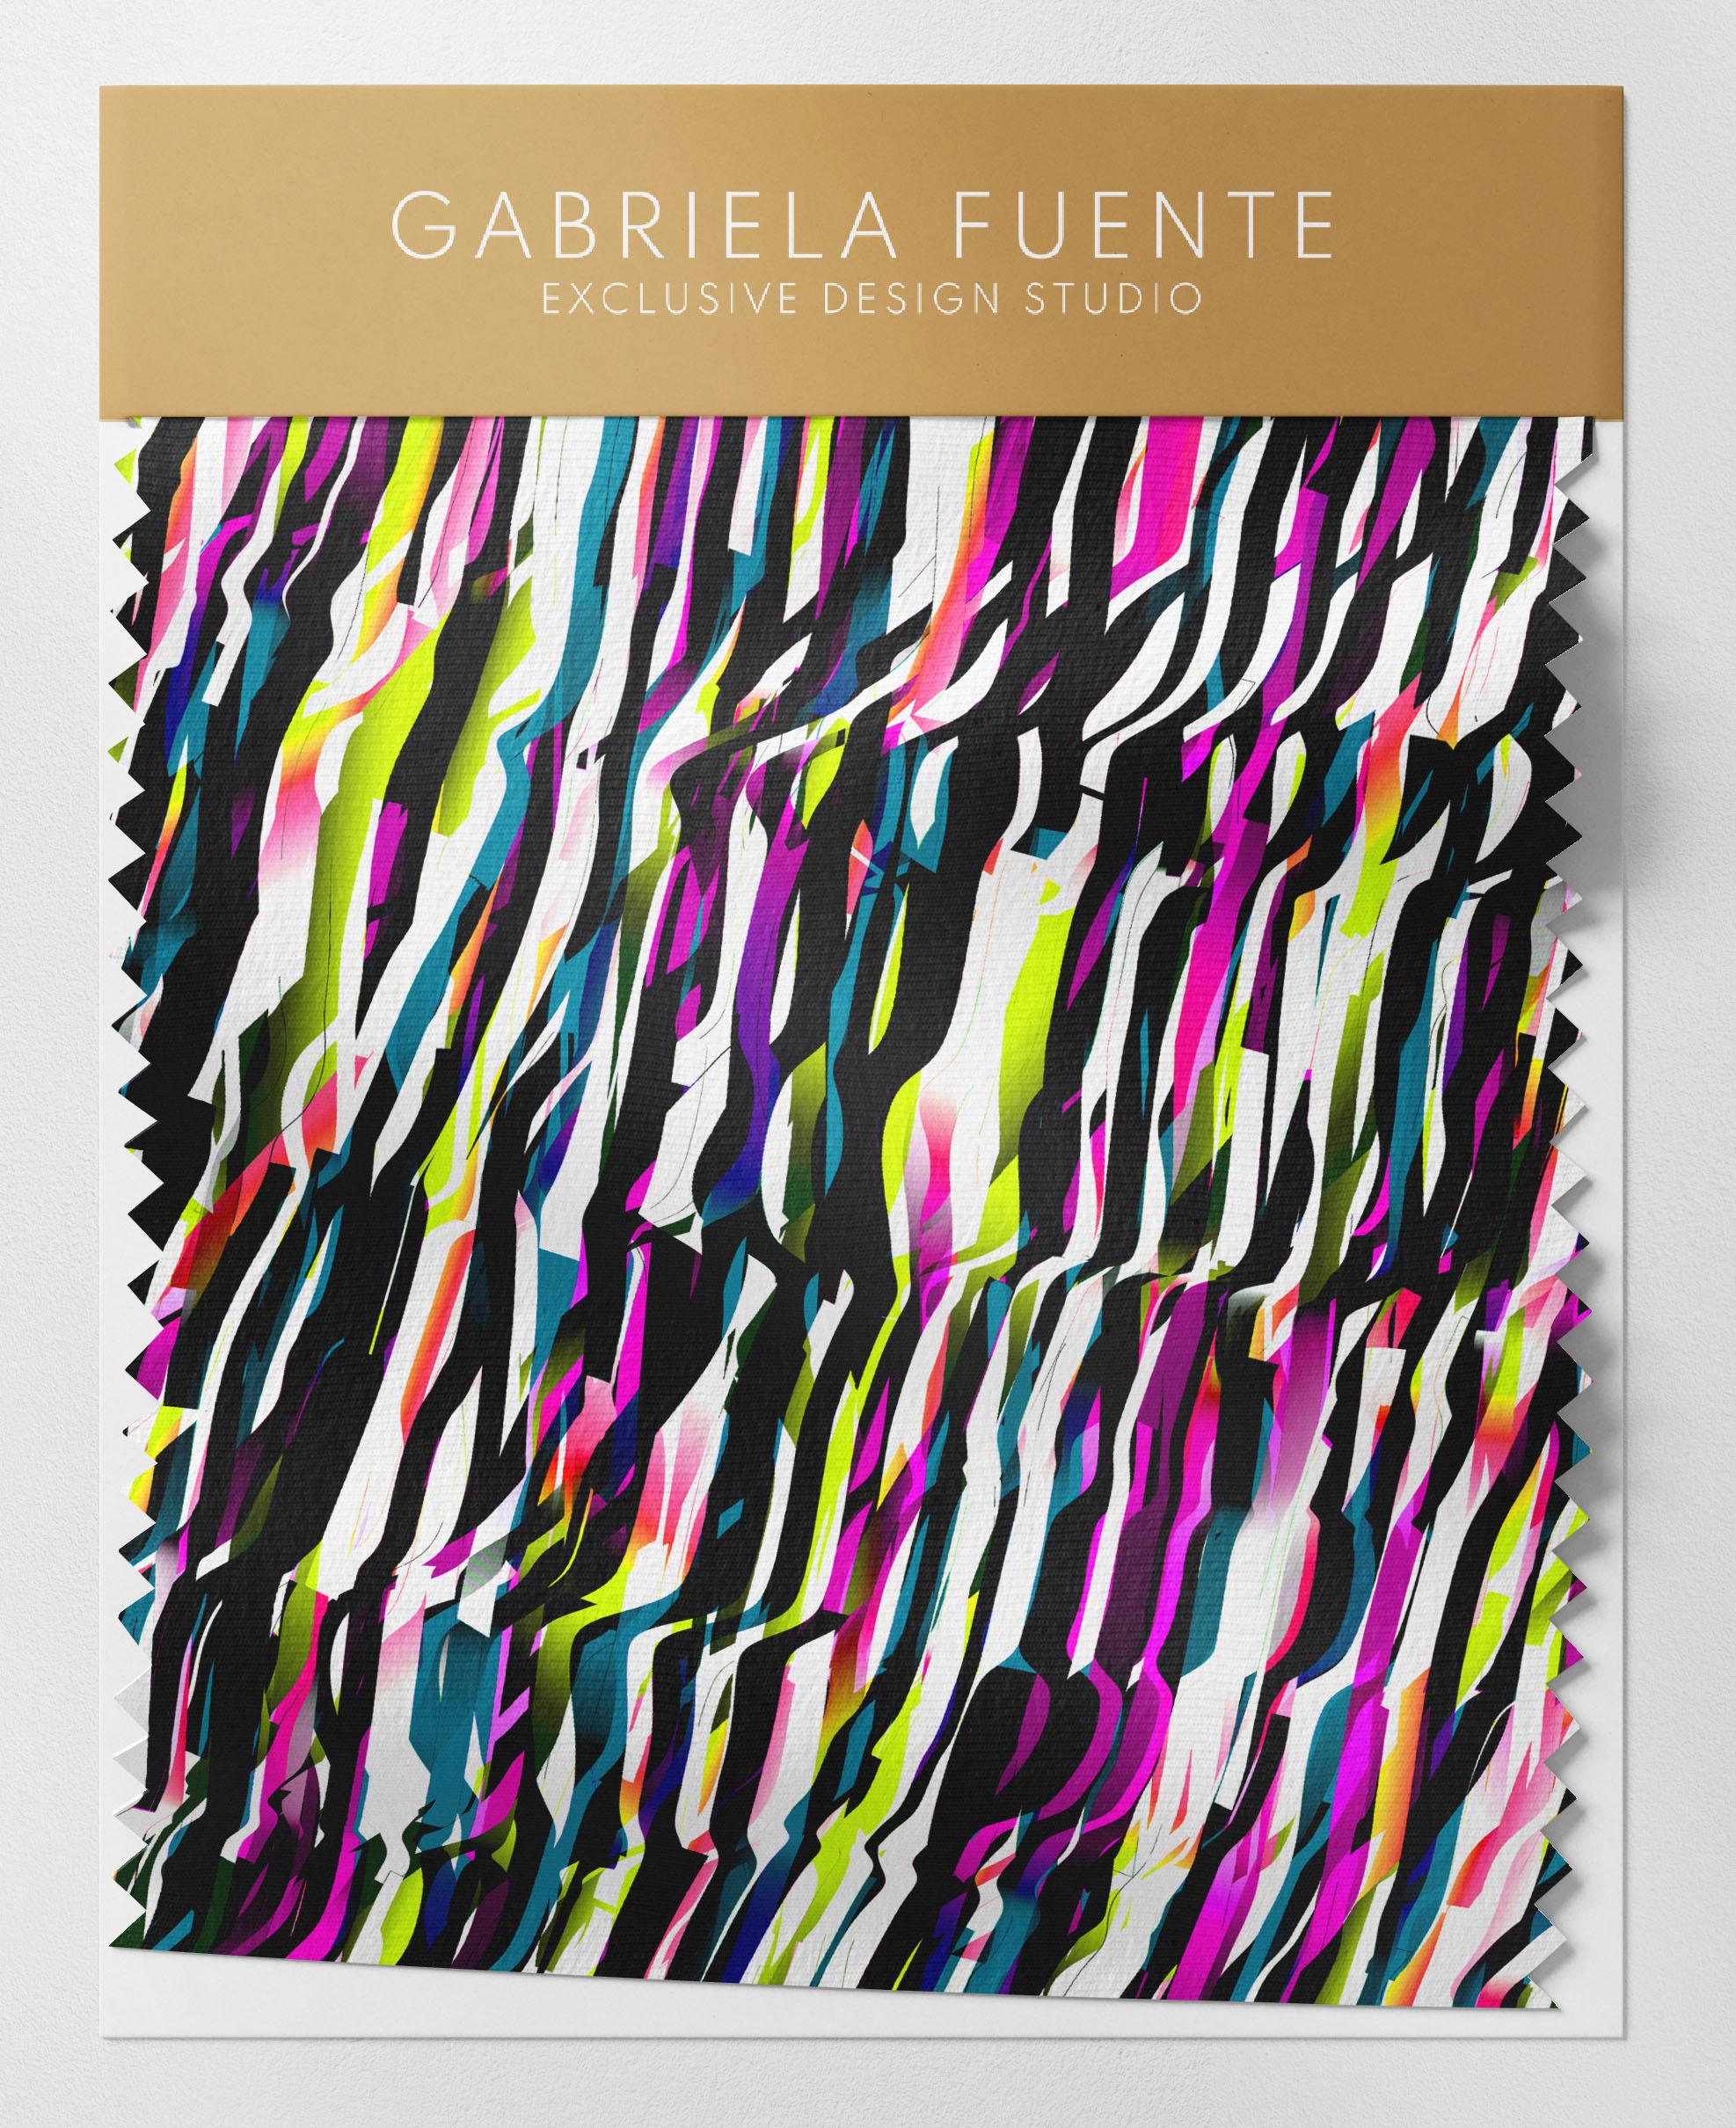 portfolio_gabriela_fuente_35.jpg